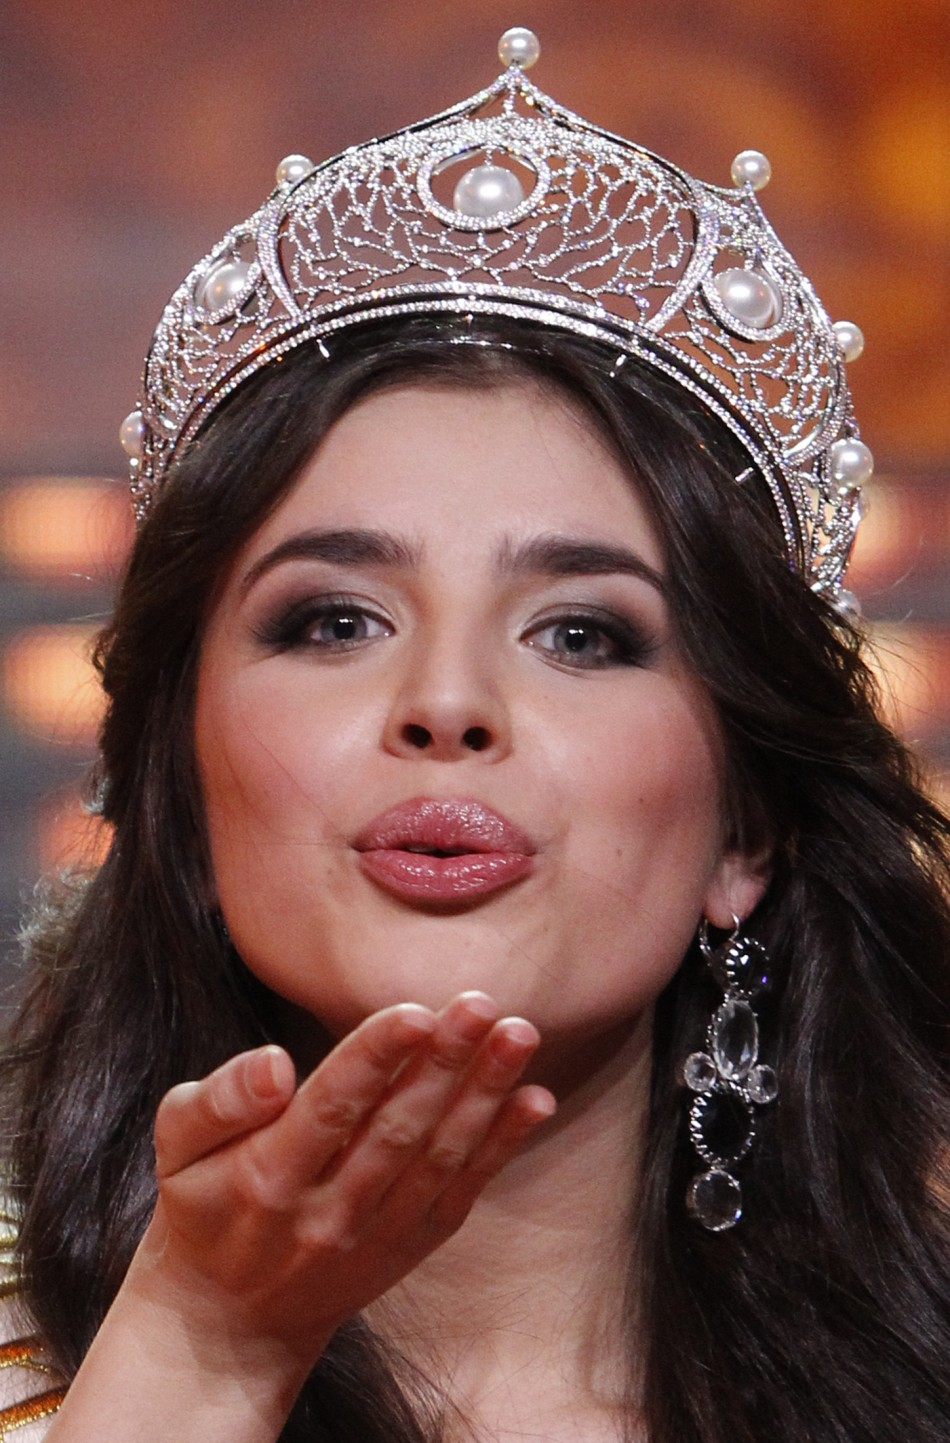 Miss Russia 2013 Elmira Abdrazakova